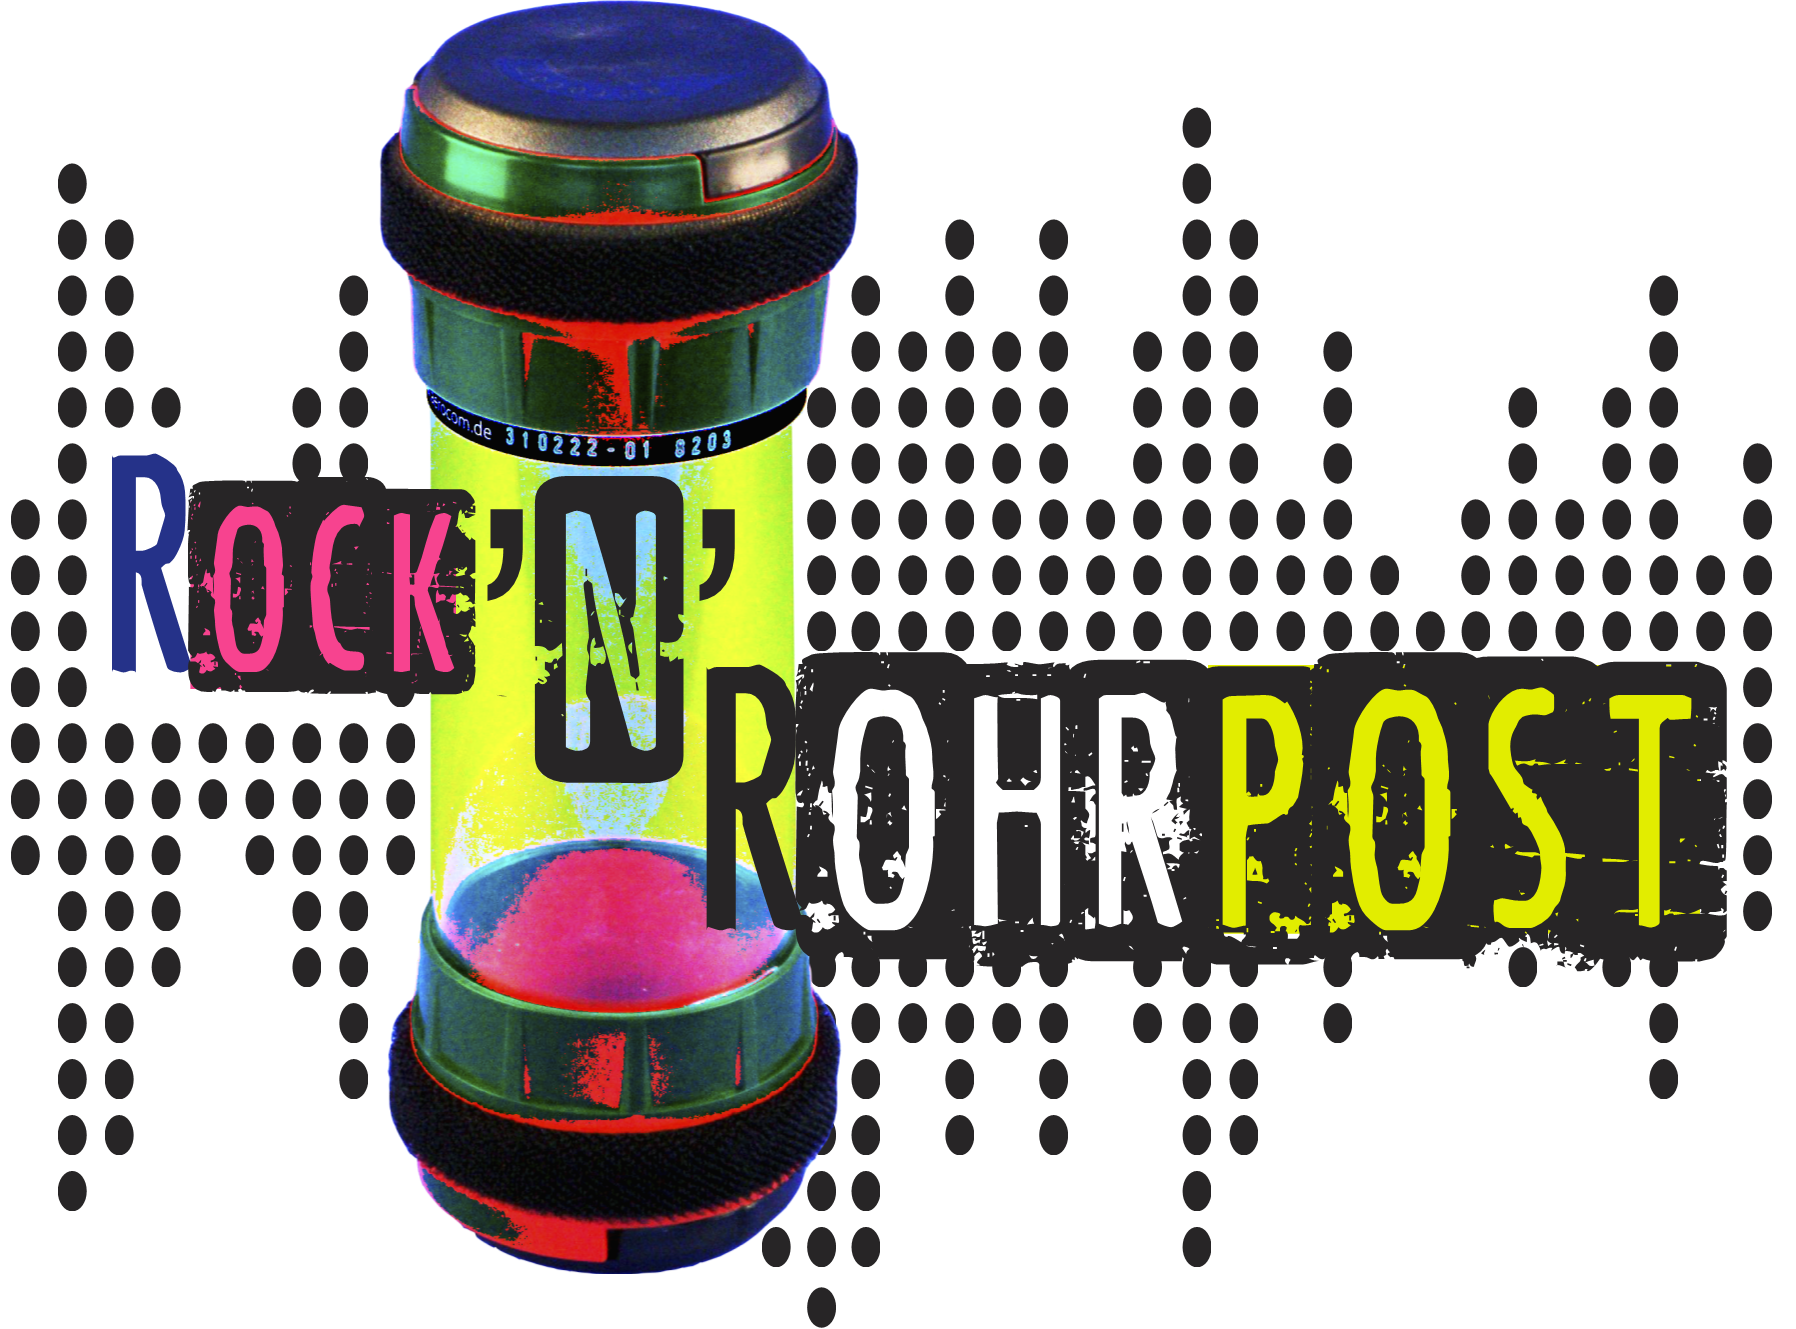 Rock'n'Rohrpost